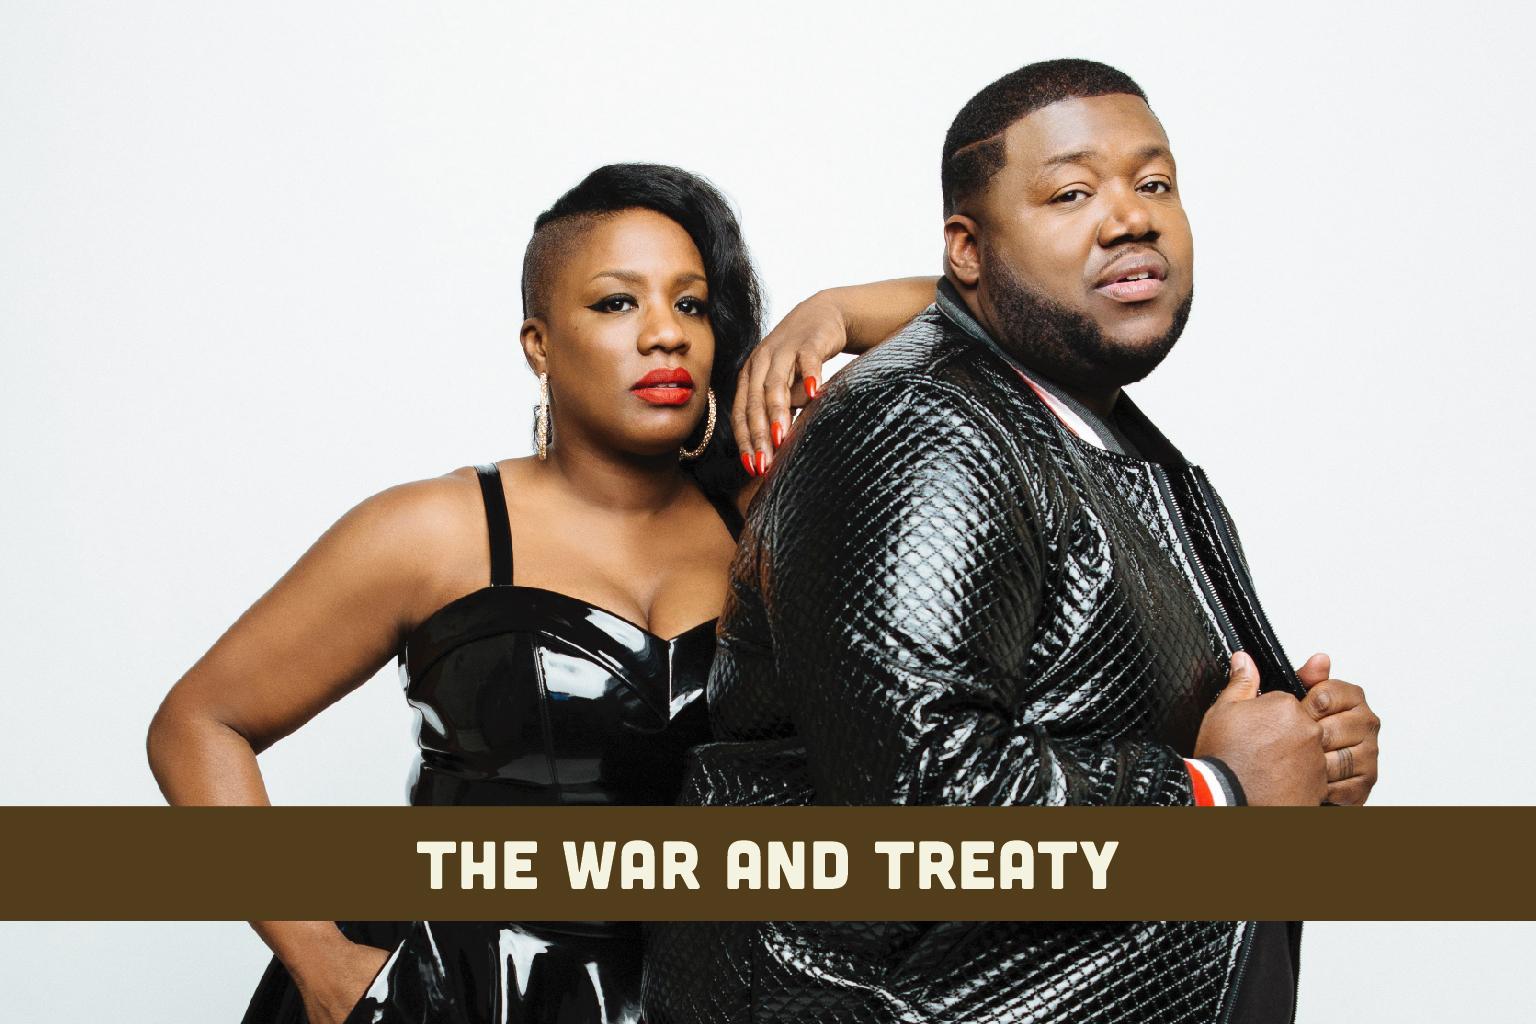 The War And Treaty